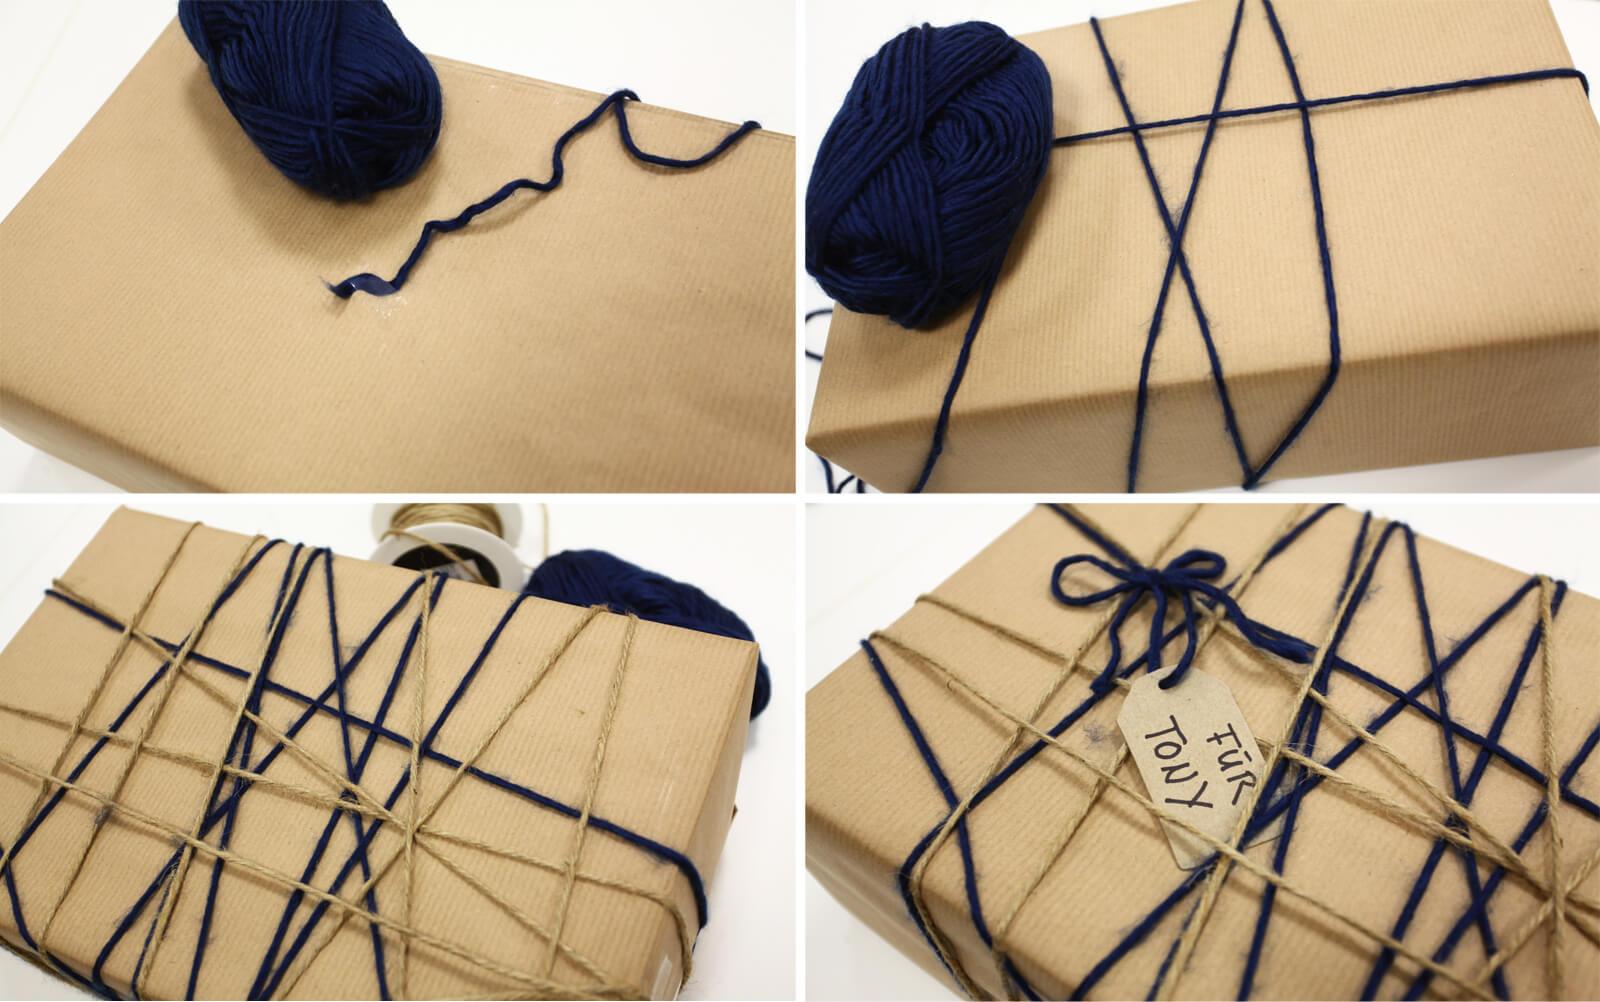 Verpackung mit Wolle